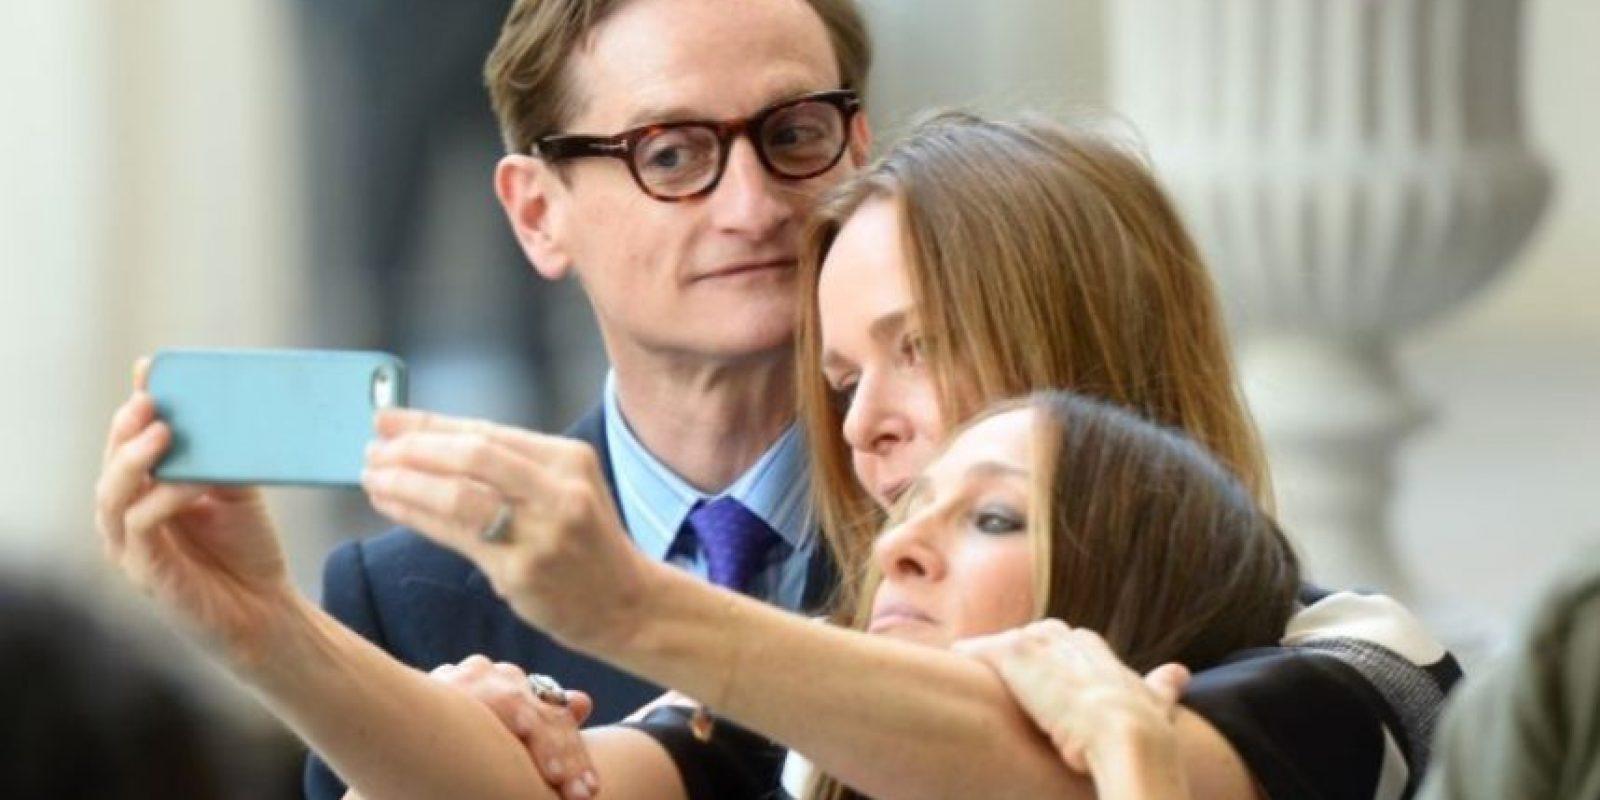 Selfie entre amigos, Hamish Bowles, Stella McCartney y Sarah Jessica Parker. Foto:Getty Images